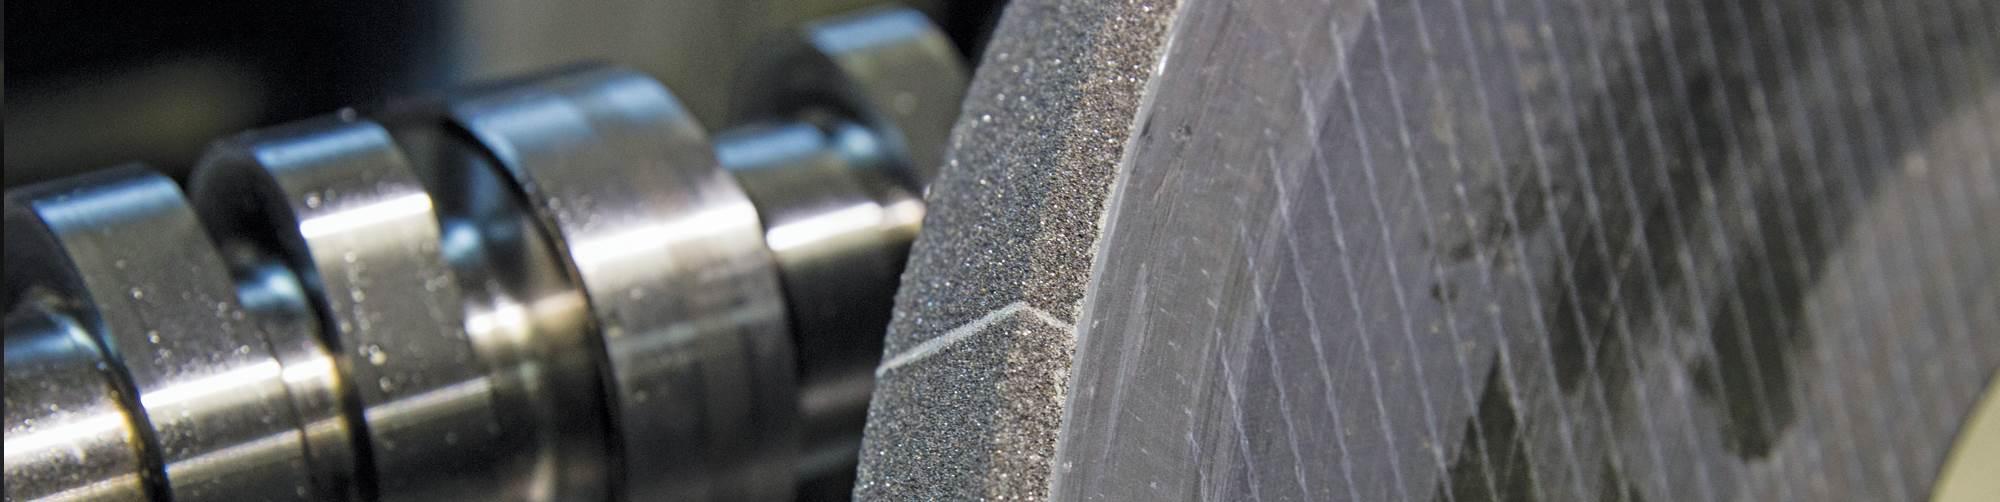 All nine of Comp Cams' CNC grinding machines use carbon-fiber-hub cBN wheels.